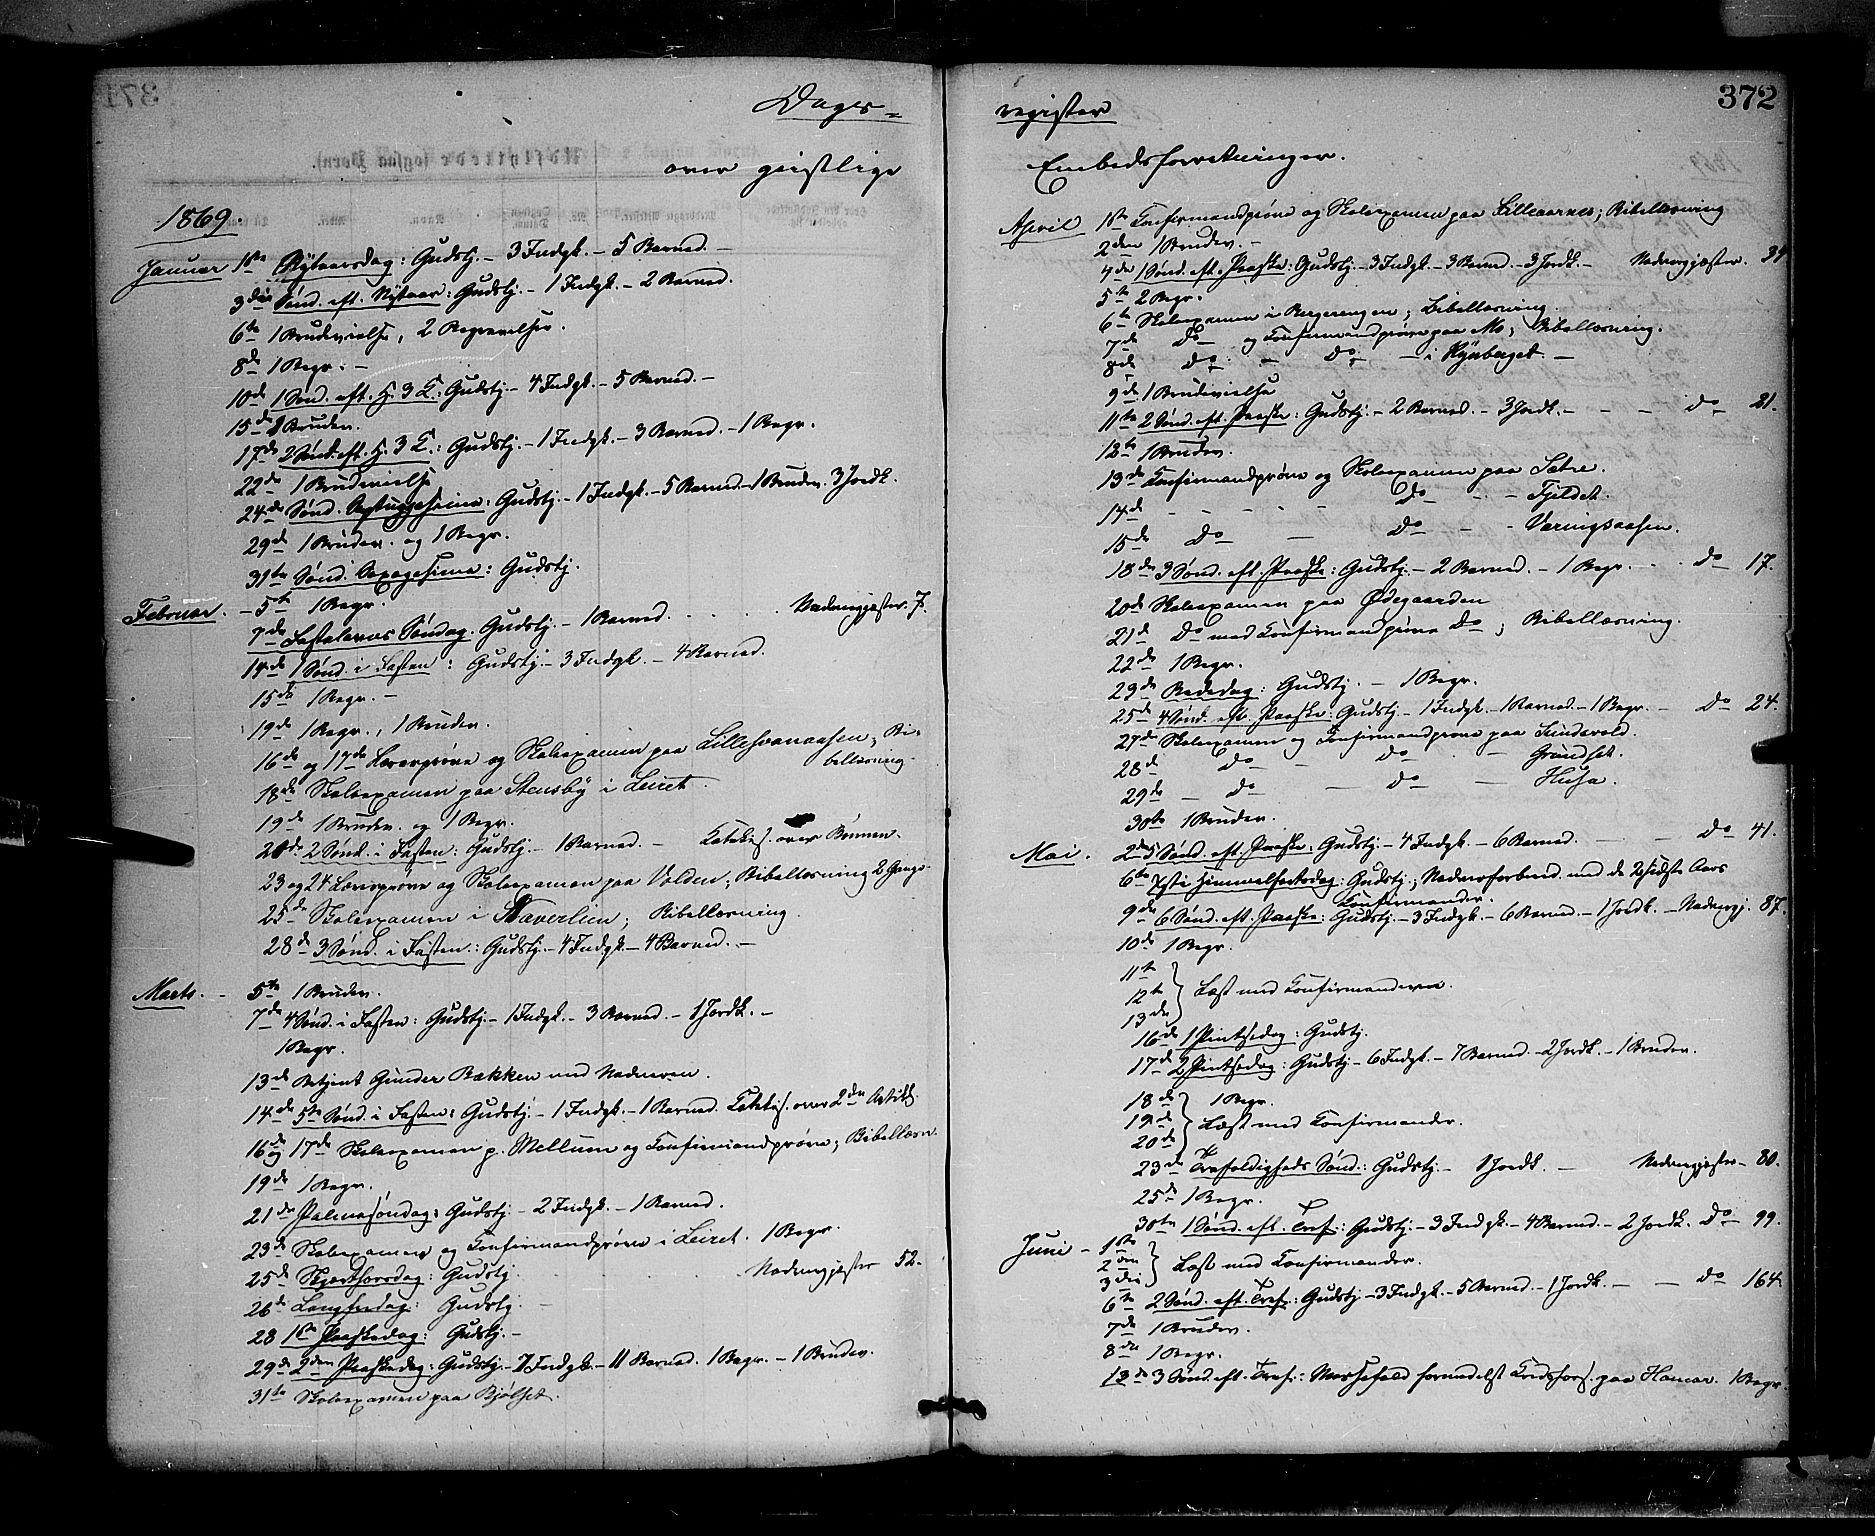 SAH, Elverum prestekontor, H/Ha/Haa/L0011: Ministerialbok nr. 11, 1869-1879, s. 372